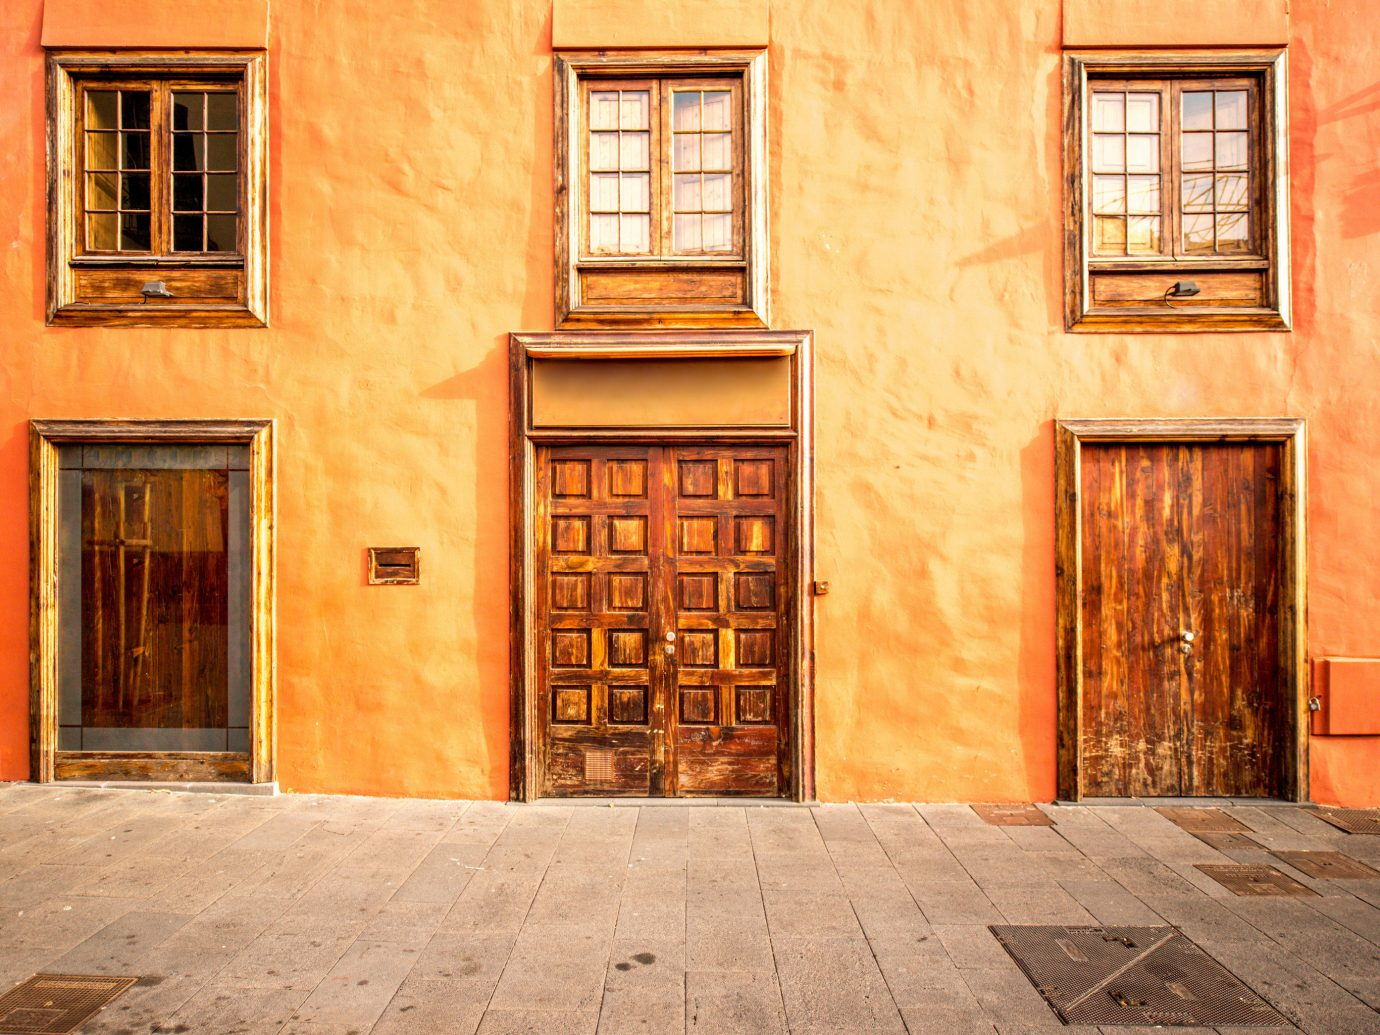 Offbeat building color outdoor door wall Architecture house facade home wood estate interior design window brick stone